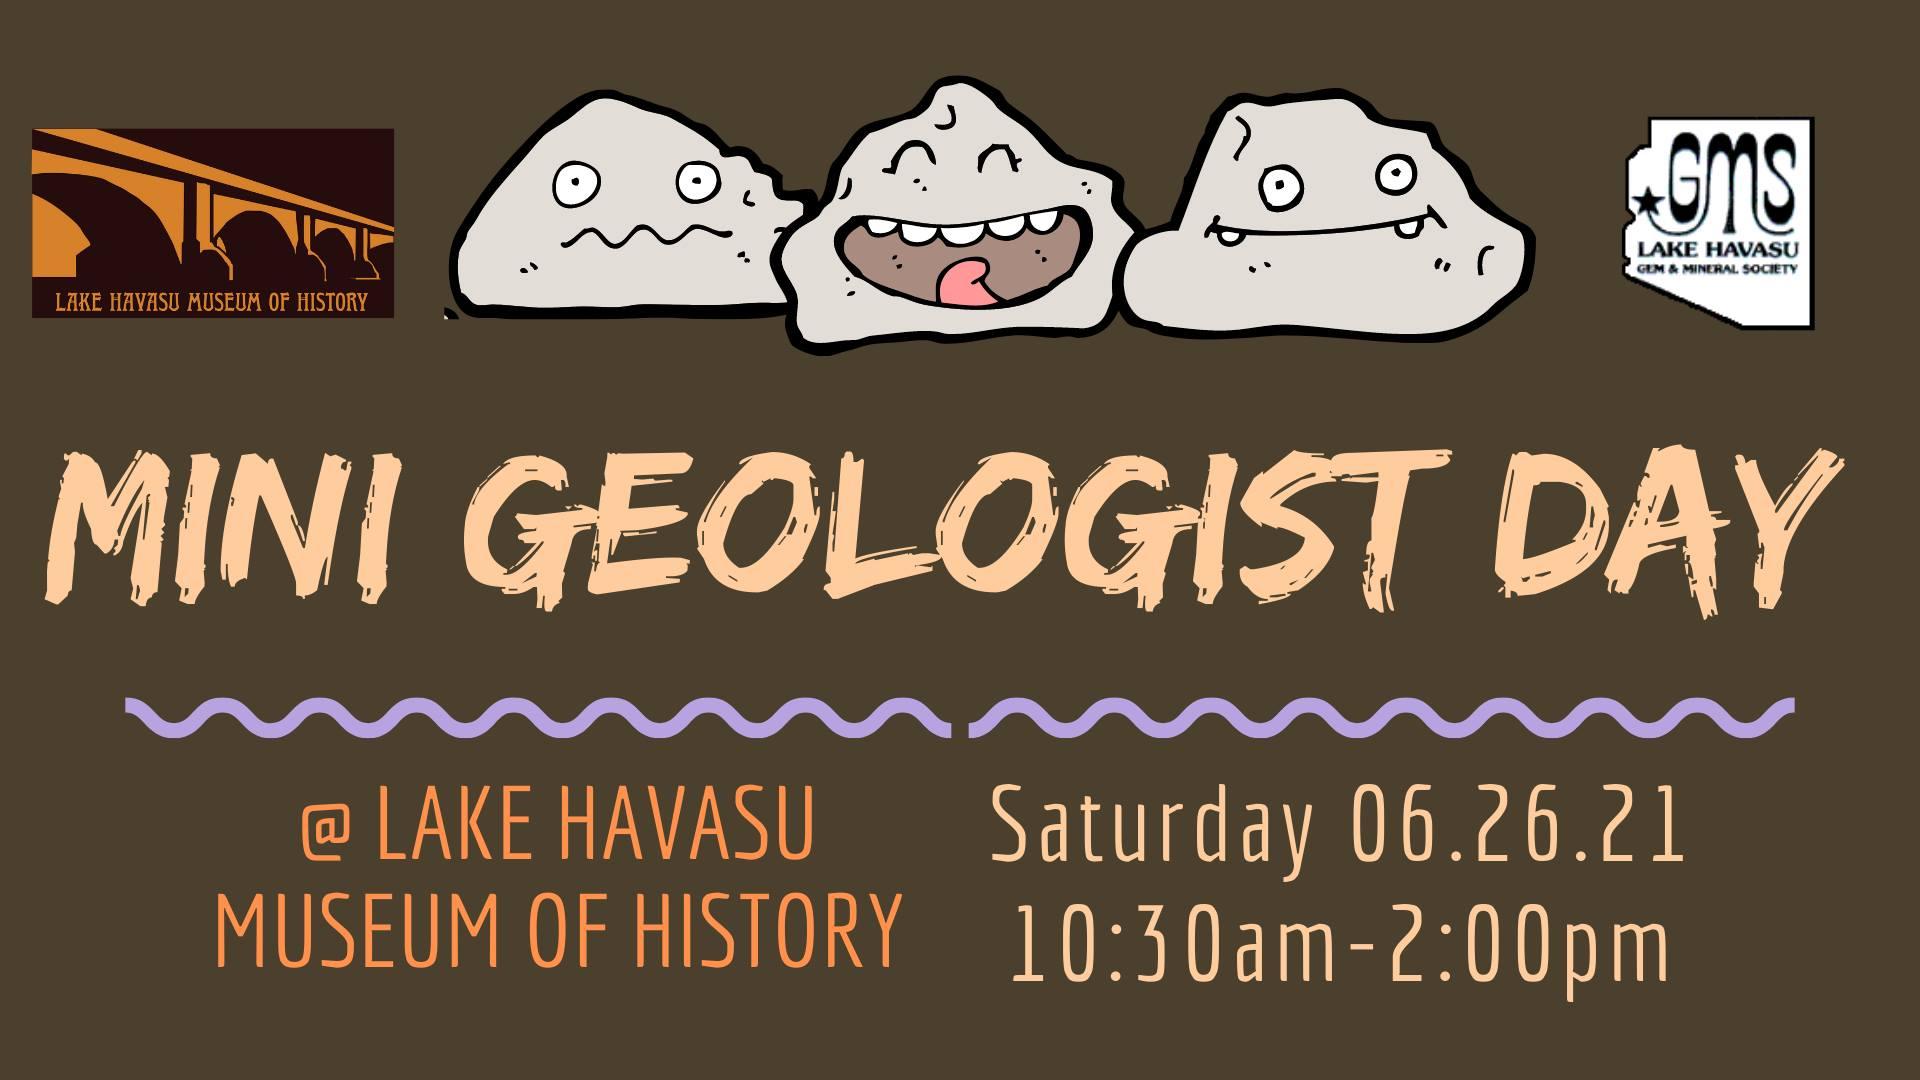 Mini Geologist Day